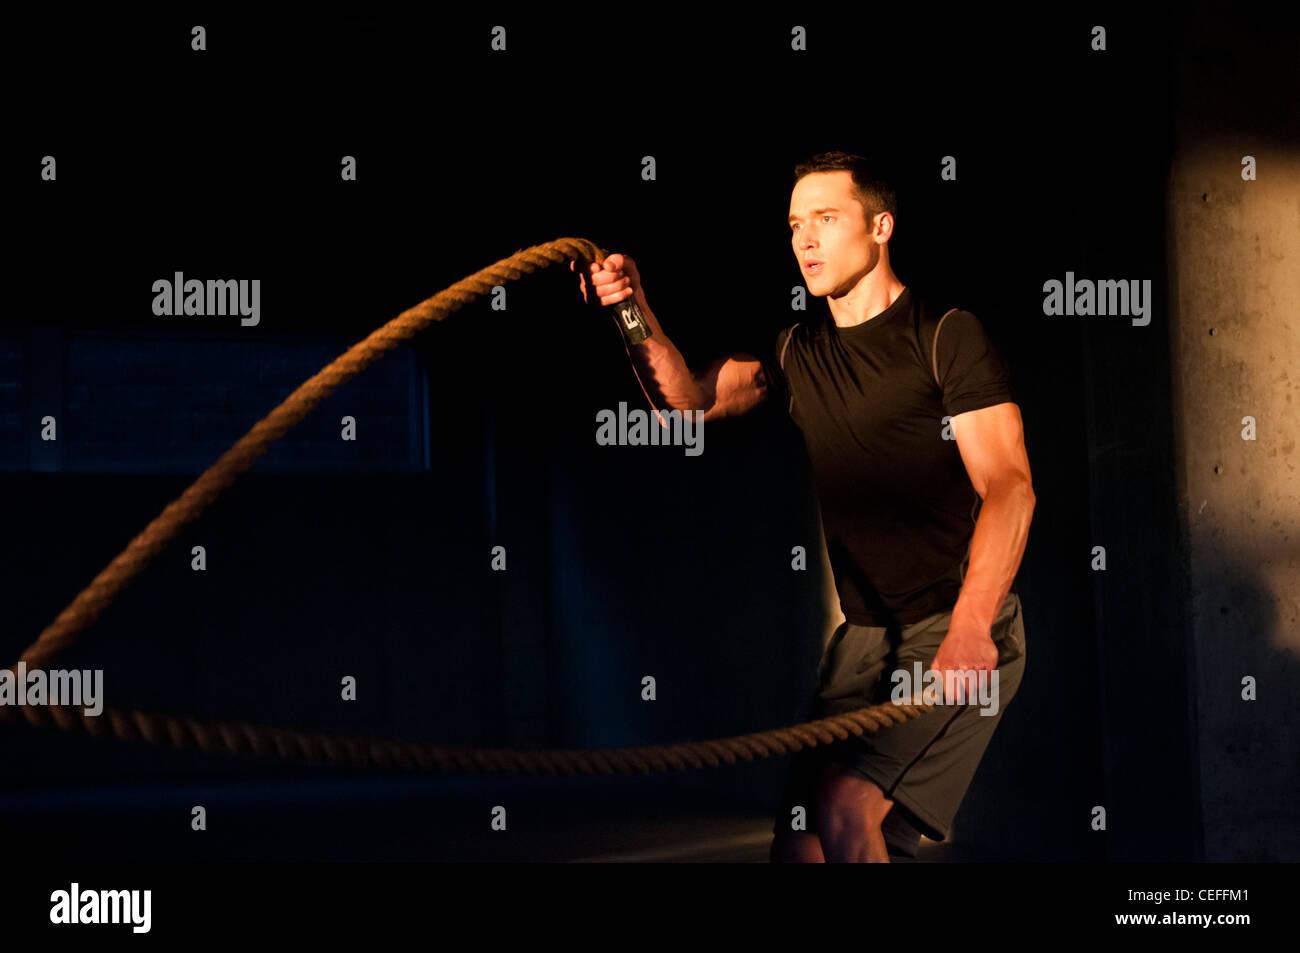 Athlete spinning jump ropes Stock Photo